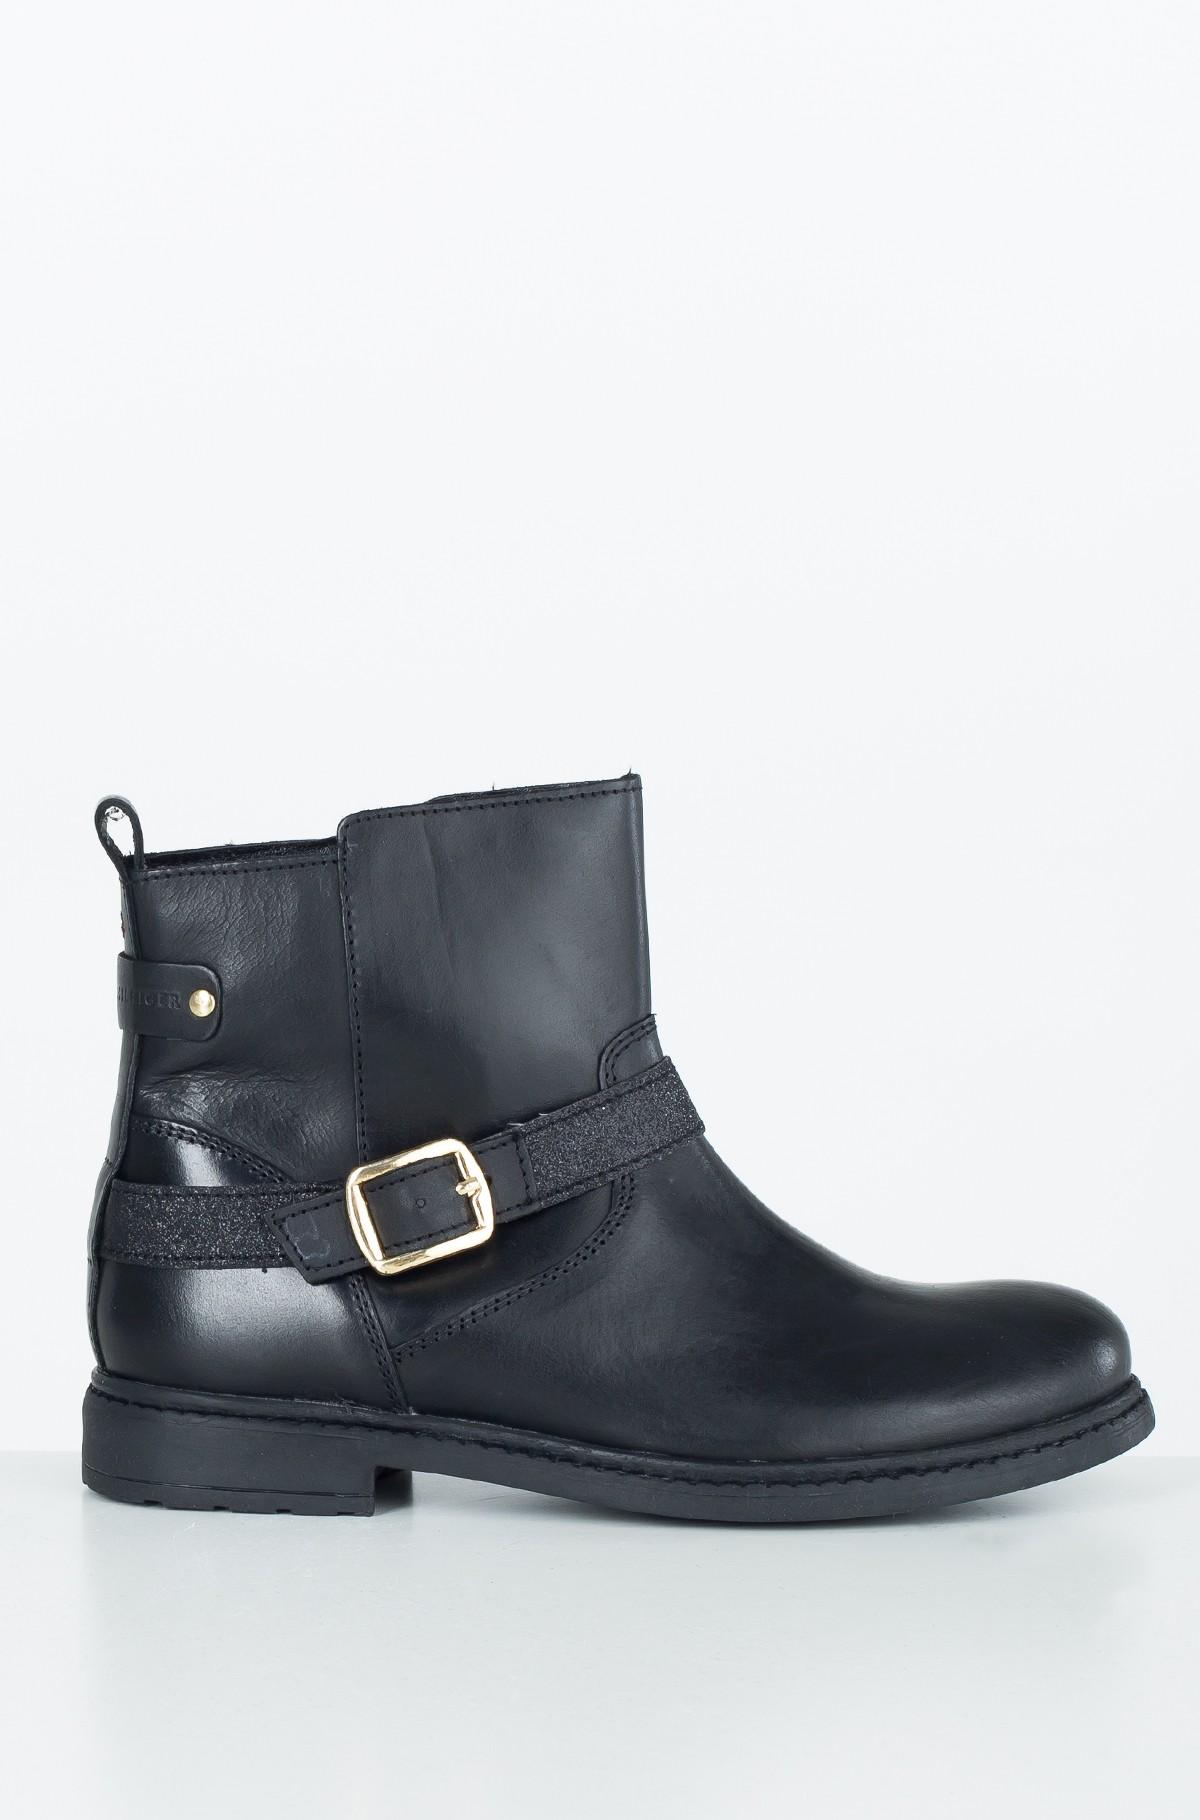 Vaikiški batai T3A6-30055-0383999-full-1